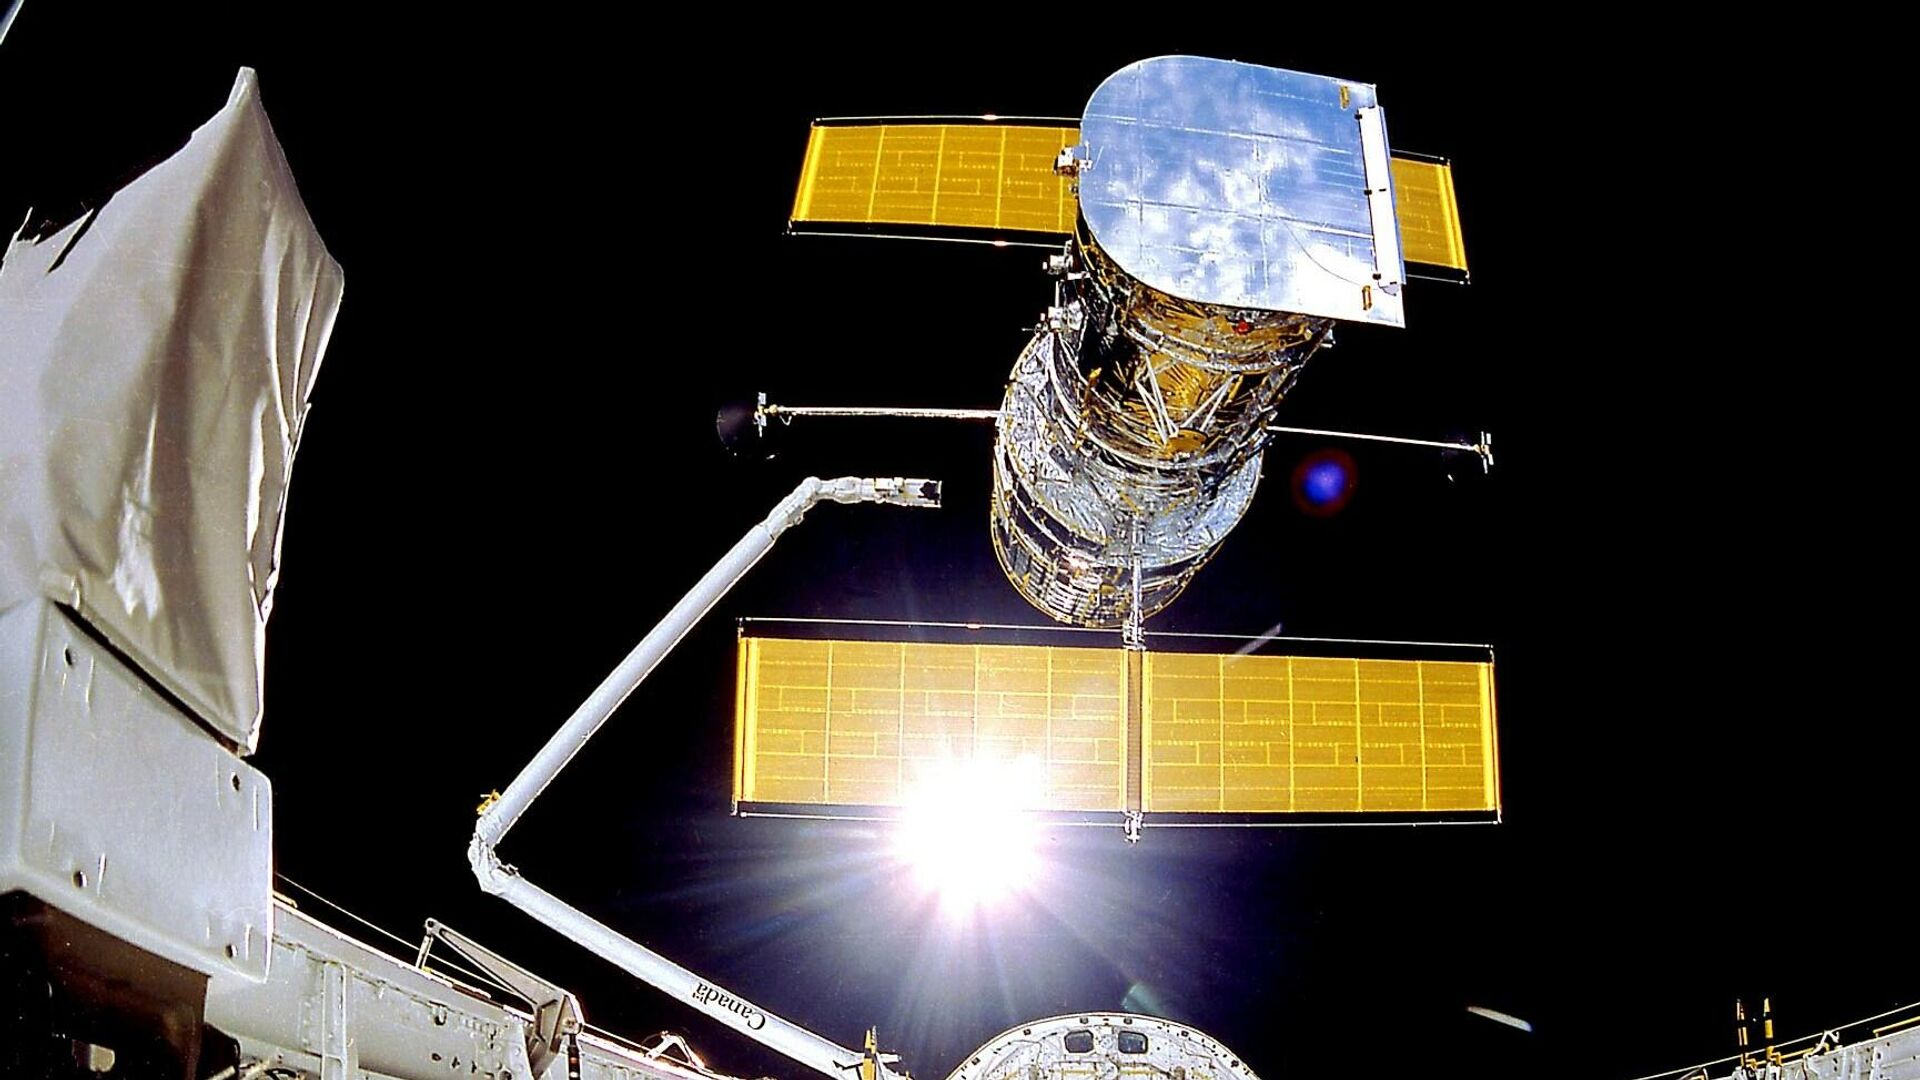 El telescopio espacial Hubble - Sputnik Mundo, 1920, 12.10.2021